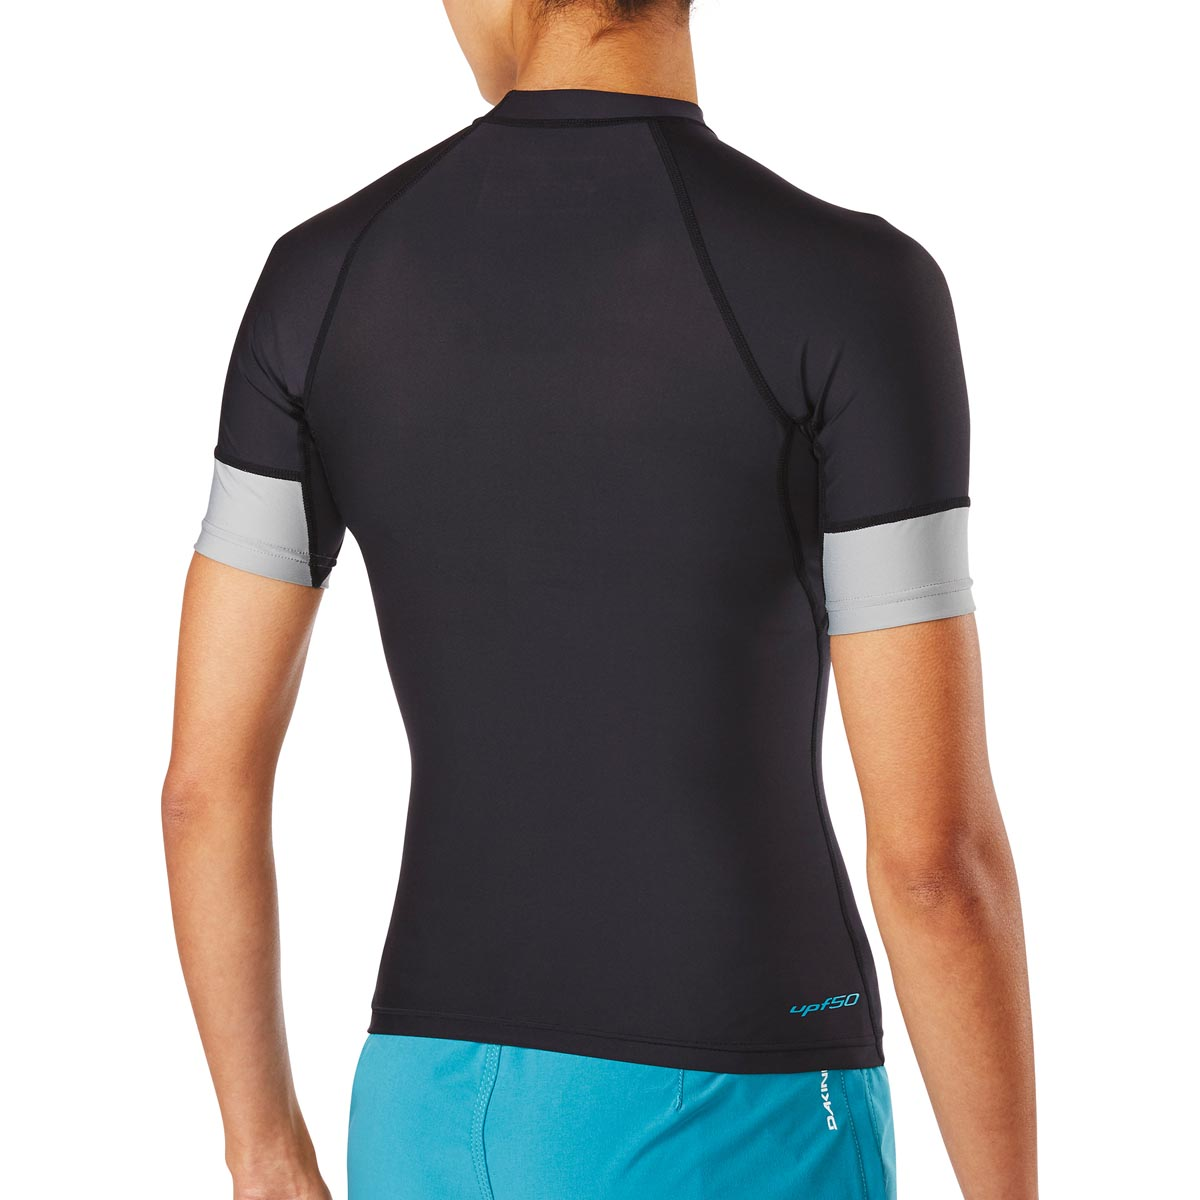 Weiterer Wassersport Dakine FLOW Damen Lycra Rash Guard Surfshirt Badeshirt Strandshirt Shirt Bekleidung